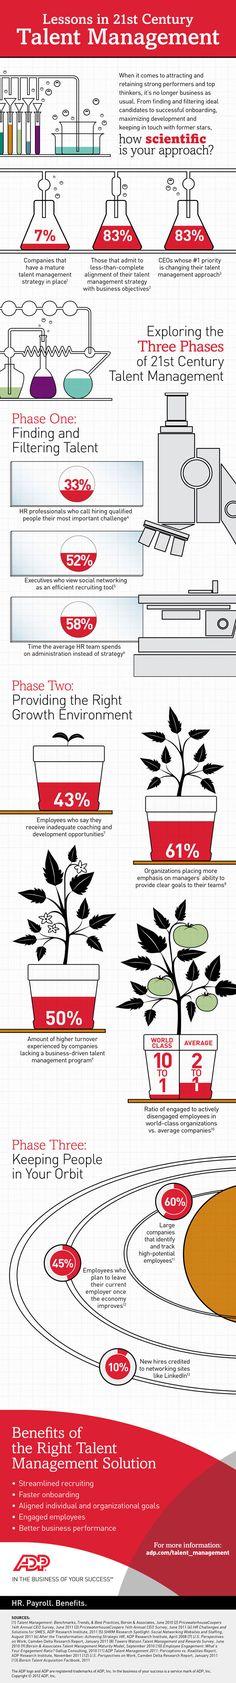 Talent Management Infographic